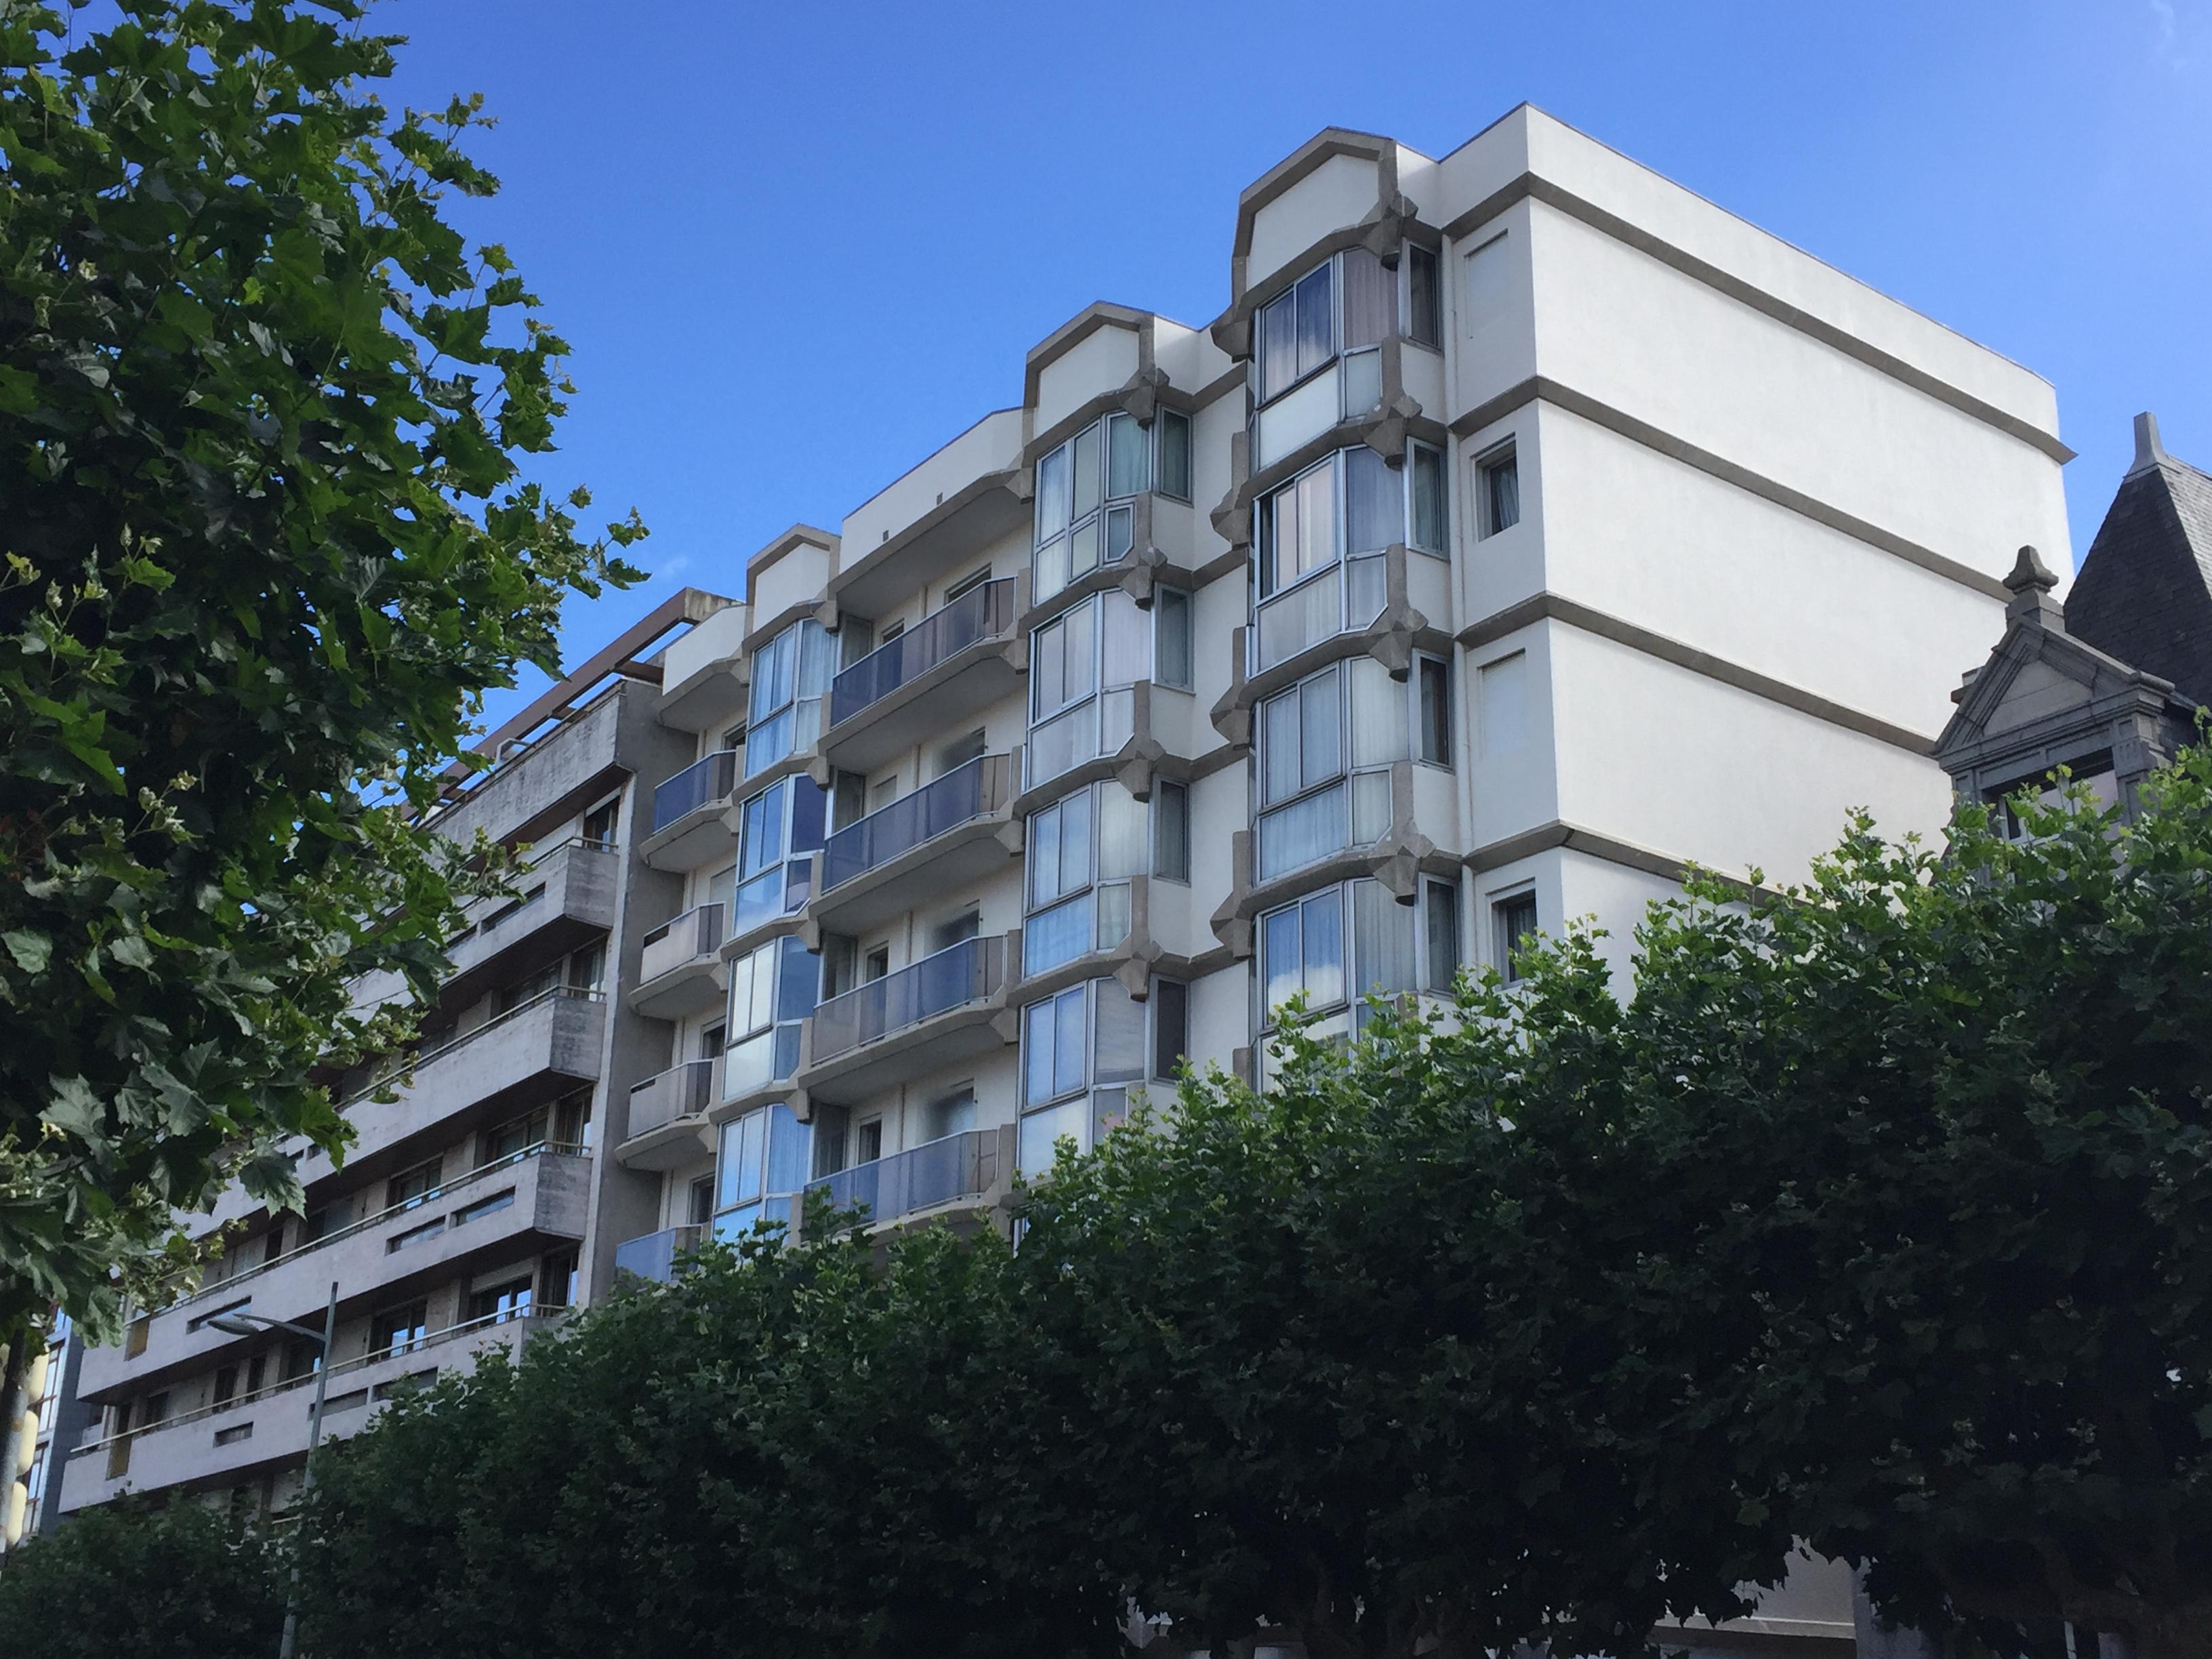 Facade pierre apparente balcon rue vide gousset rfection duune faade piquage de luenduit - Ravalement de facade pierre apparente ...